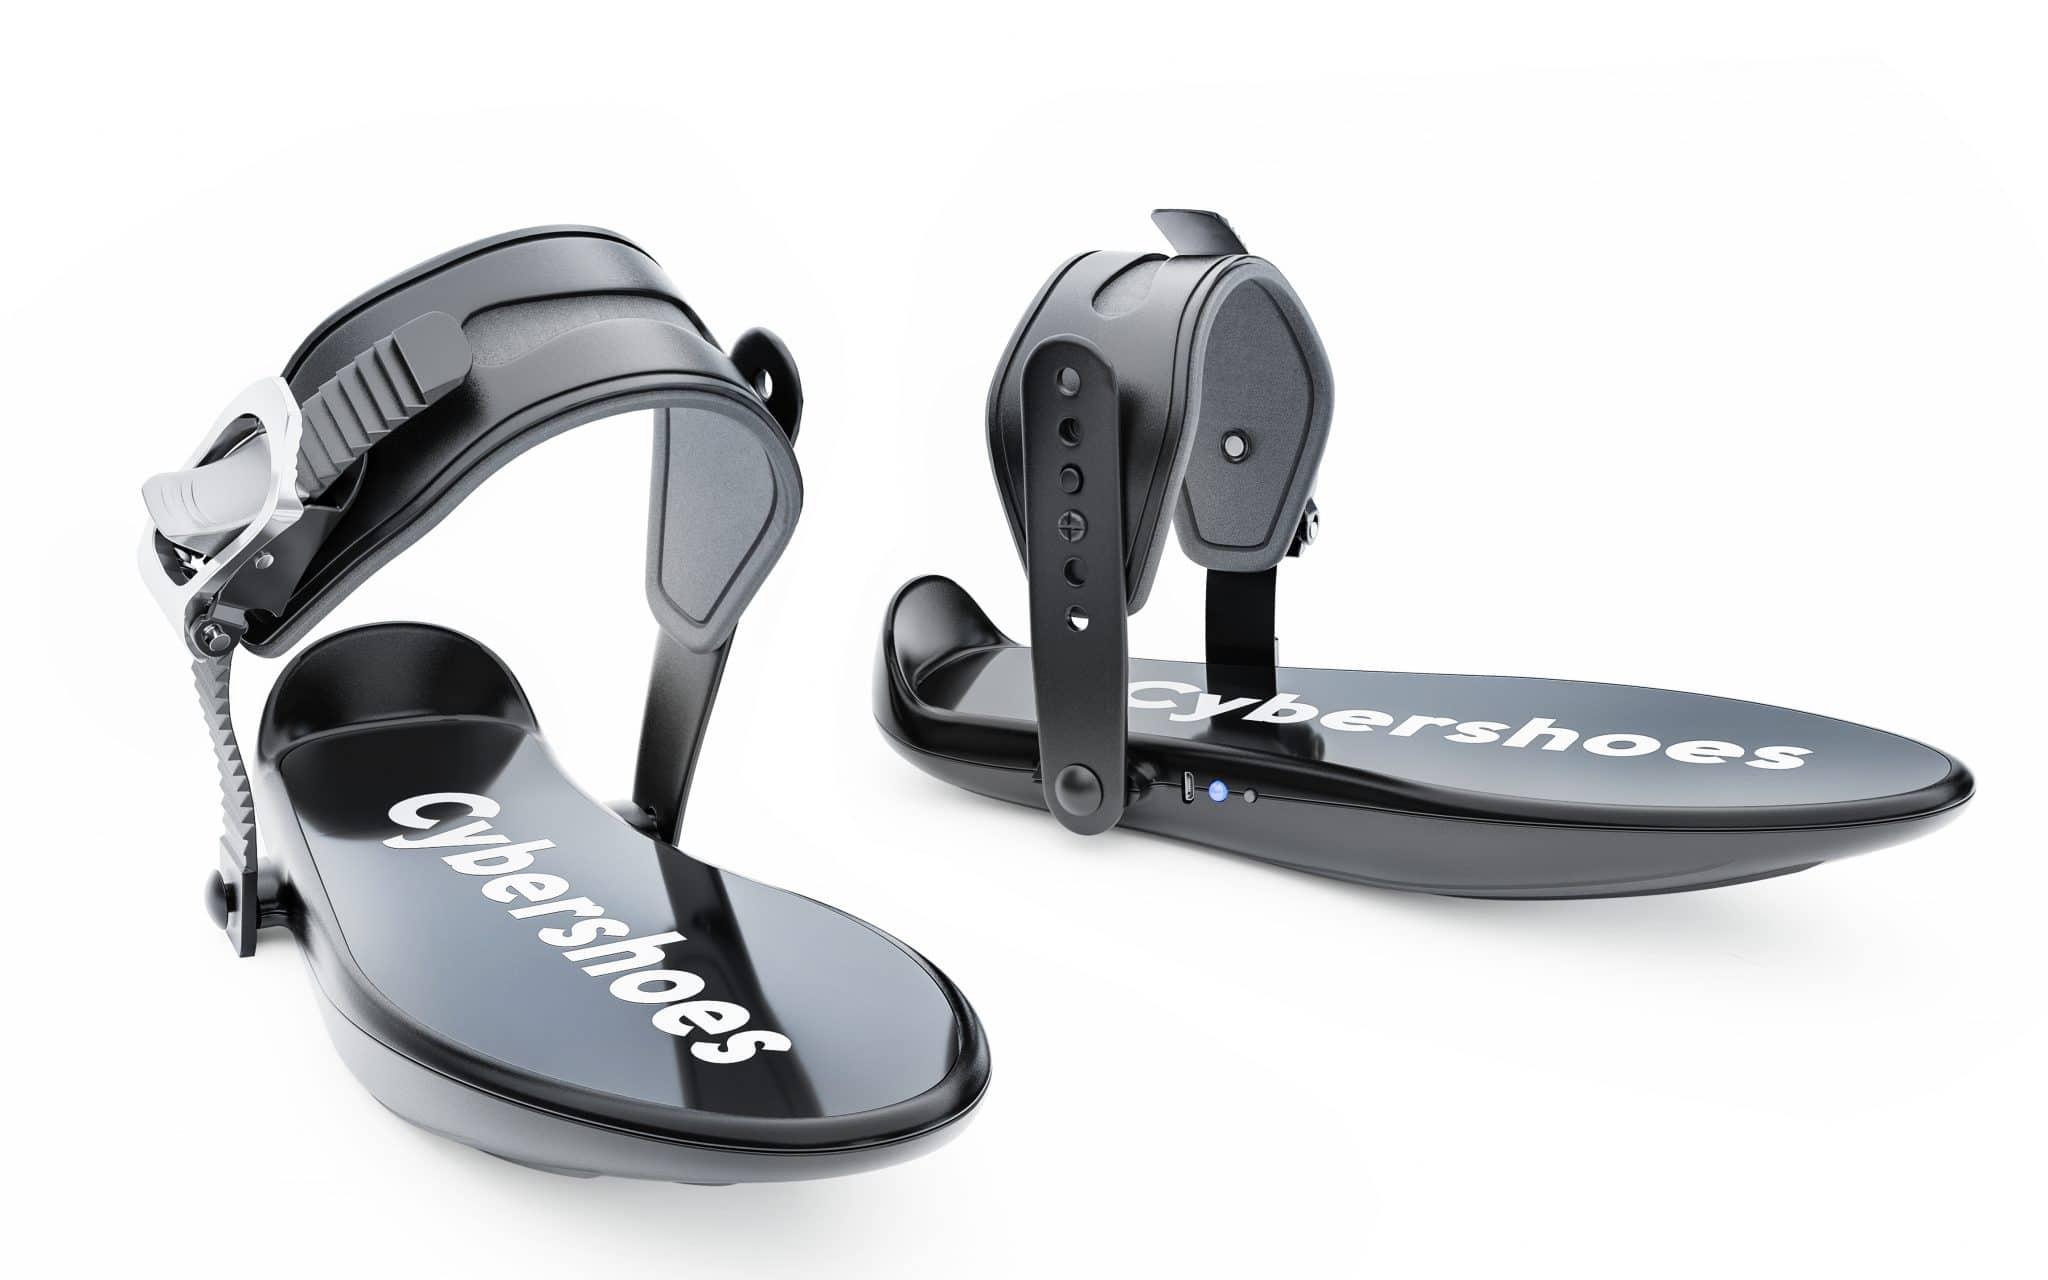 Cybershoes_Oculus_Quest